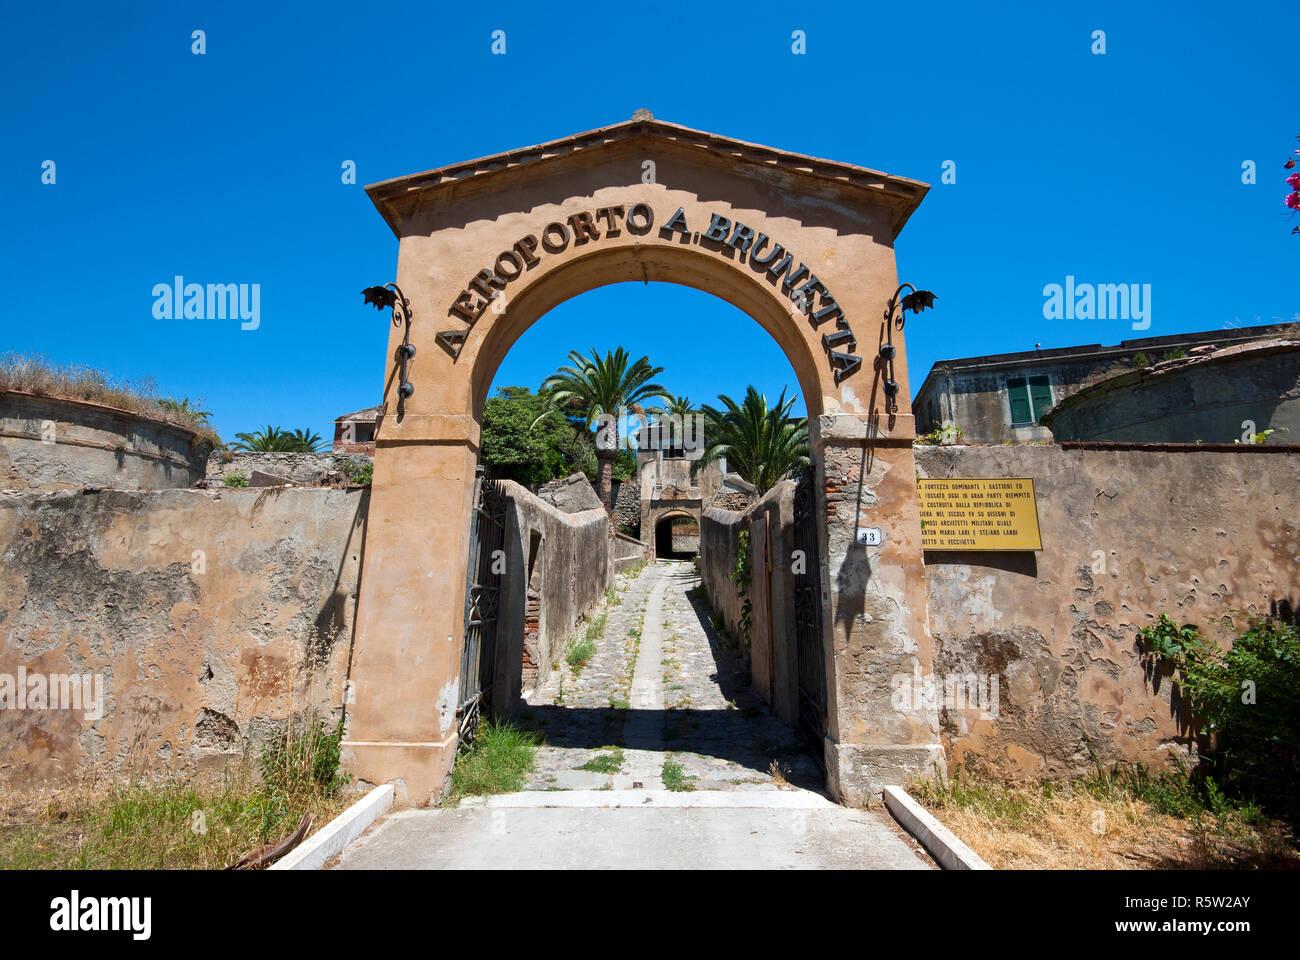 Ex military airport 'Agostino Brunetta', Orbetello, Grosseto, Tuscany, Italy - Stock Image